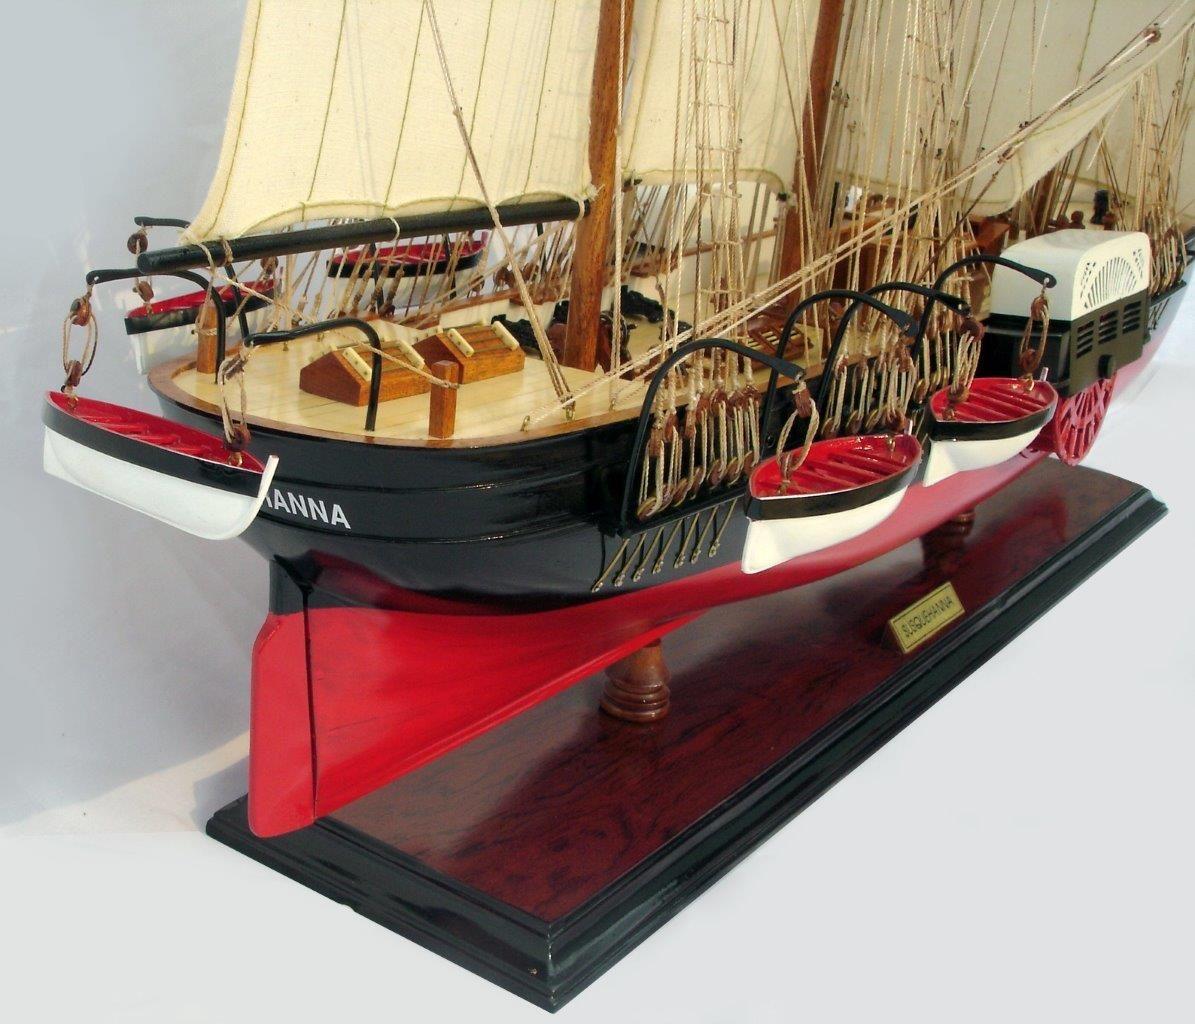 2098-12475-USS-Susquehanna-Model-Boat